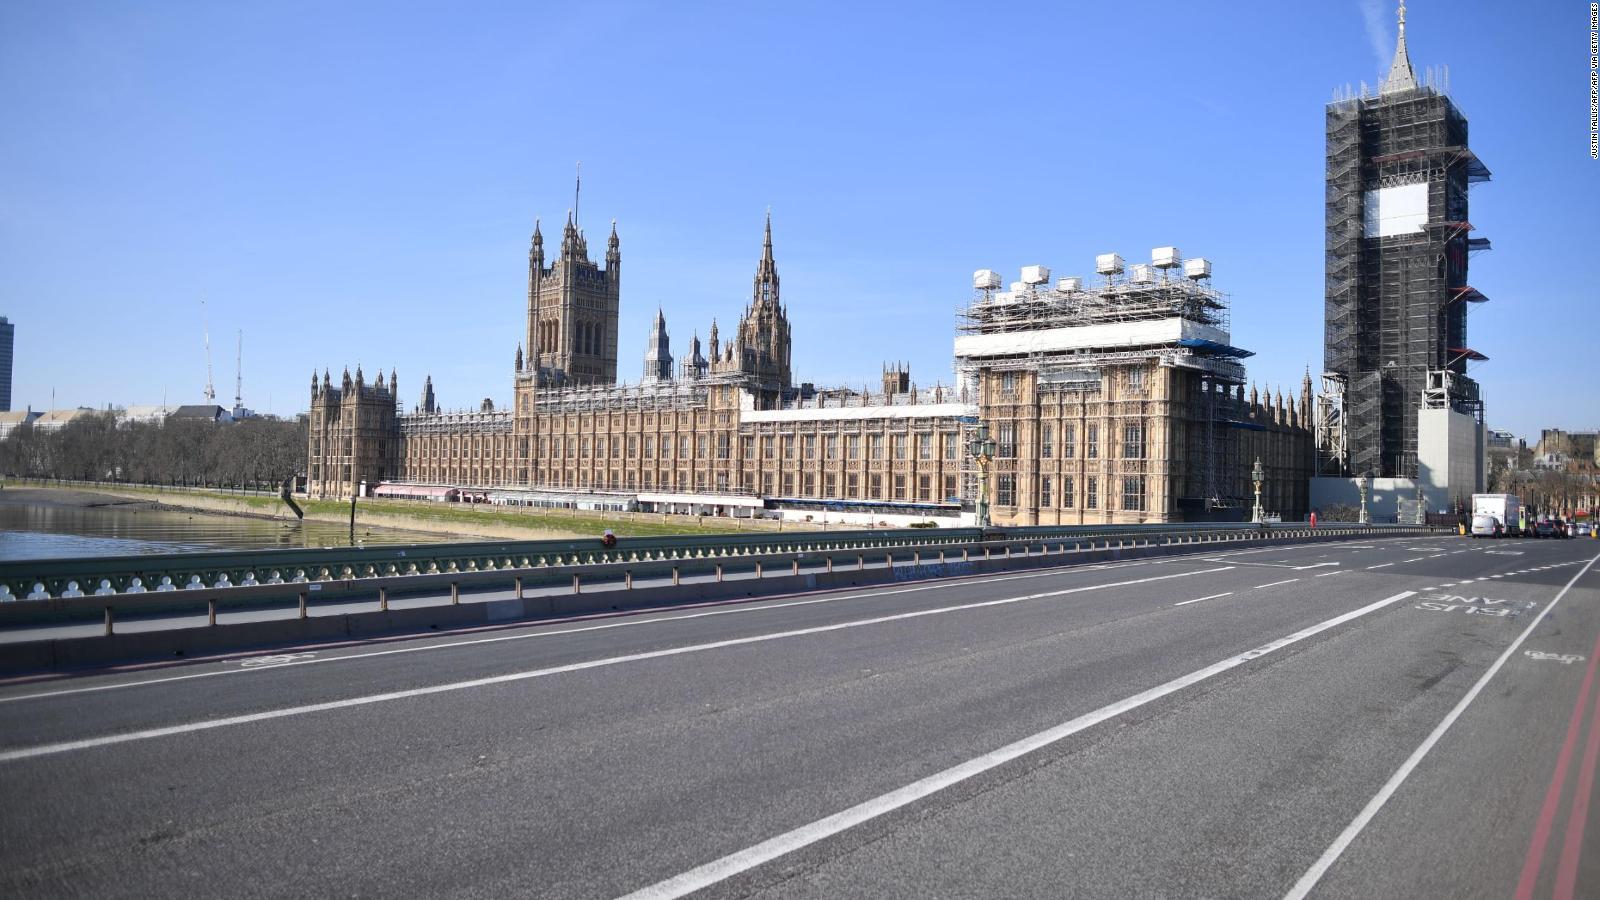 Uk Coronavirus Response Criticized For Turning Britain Into Police State Cnn